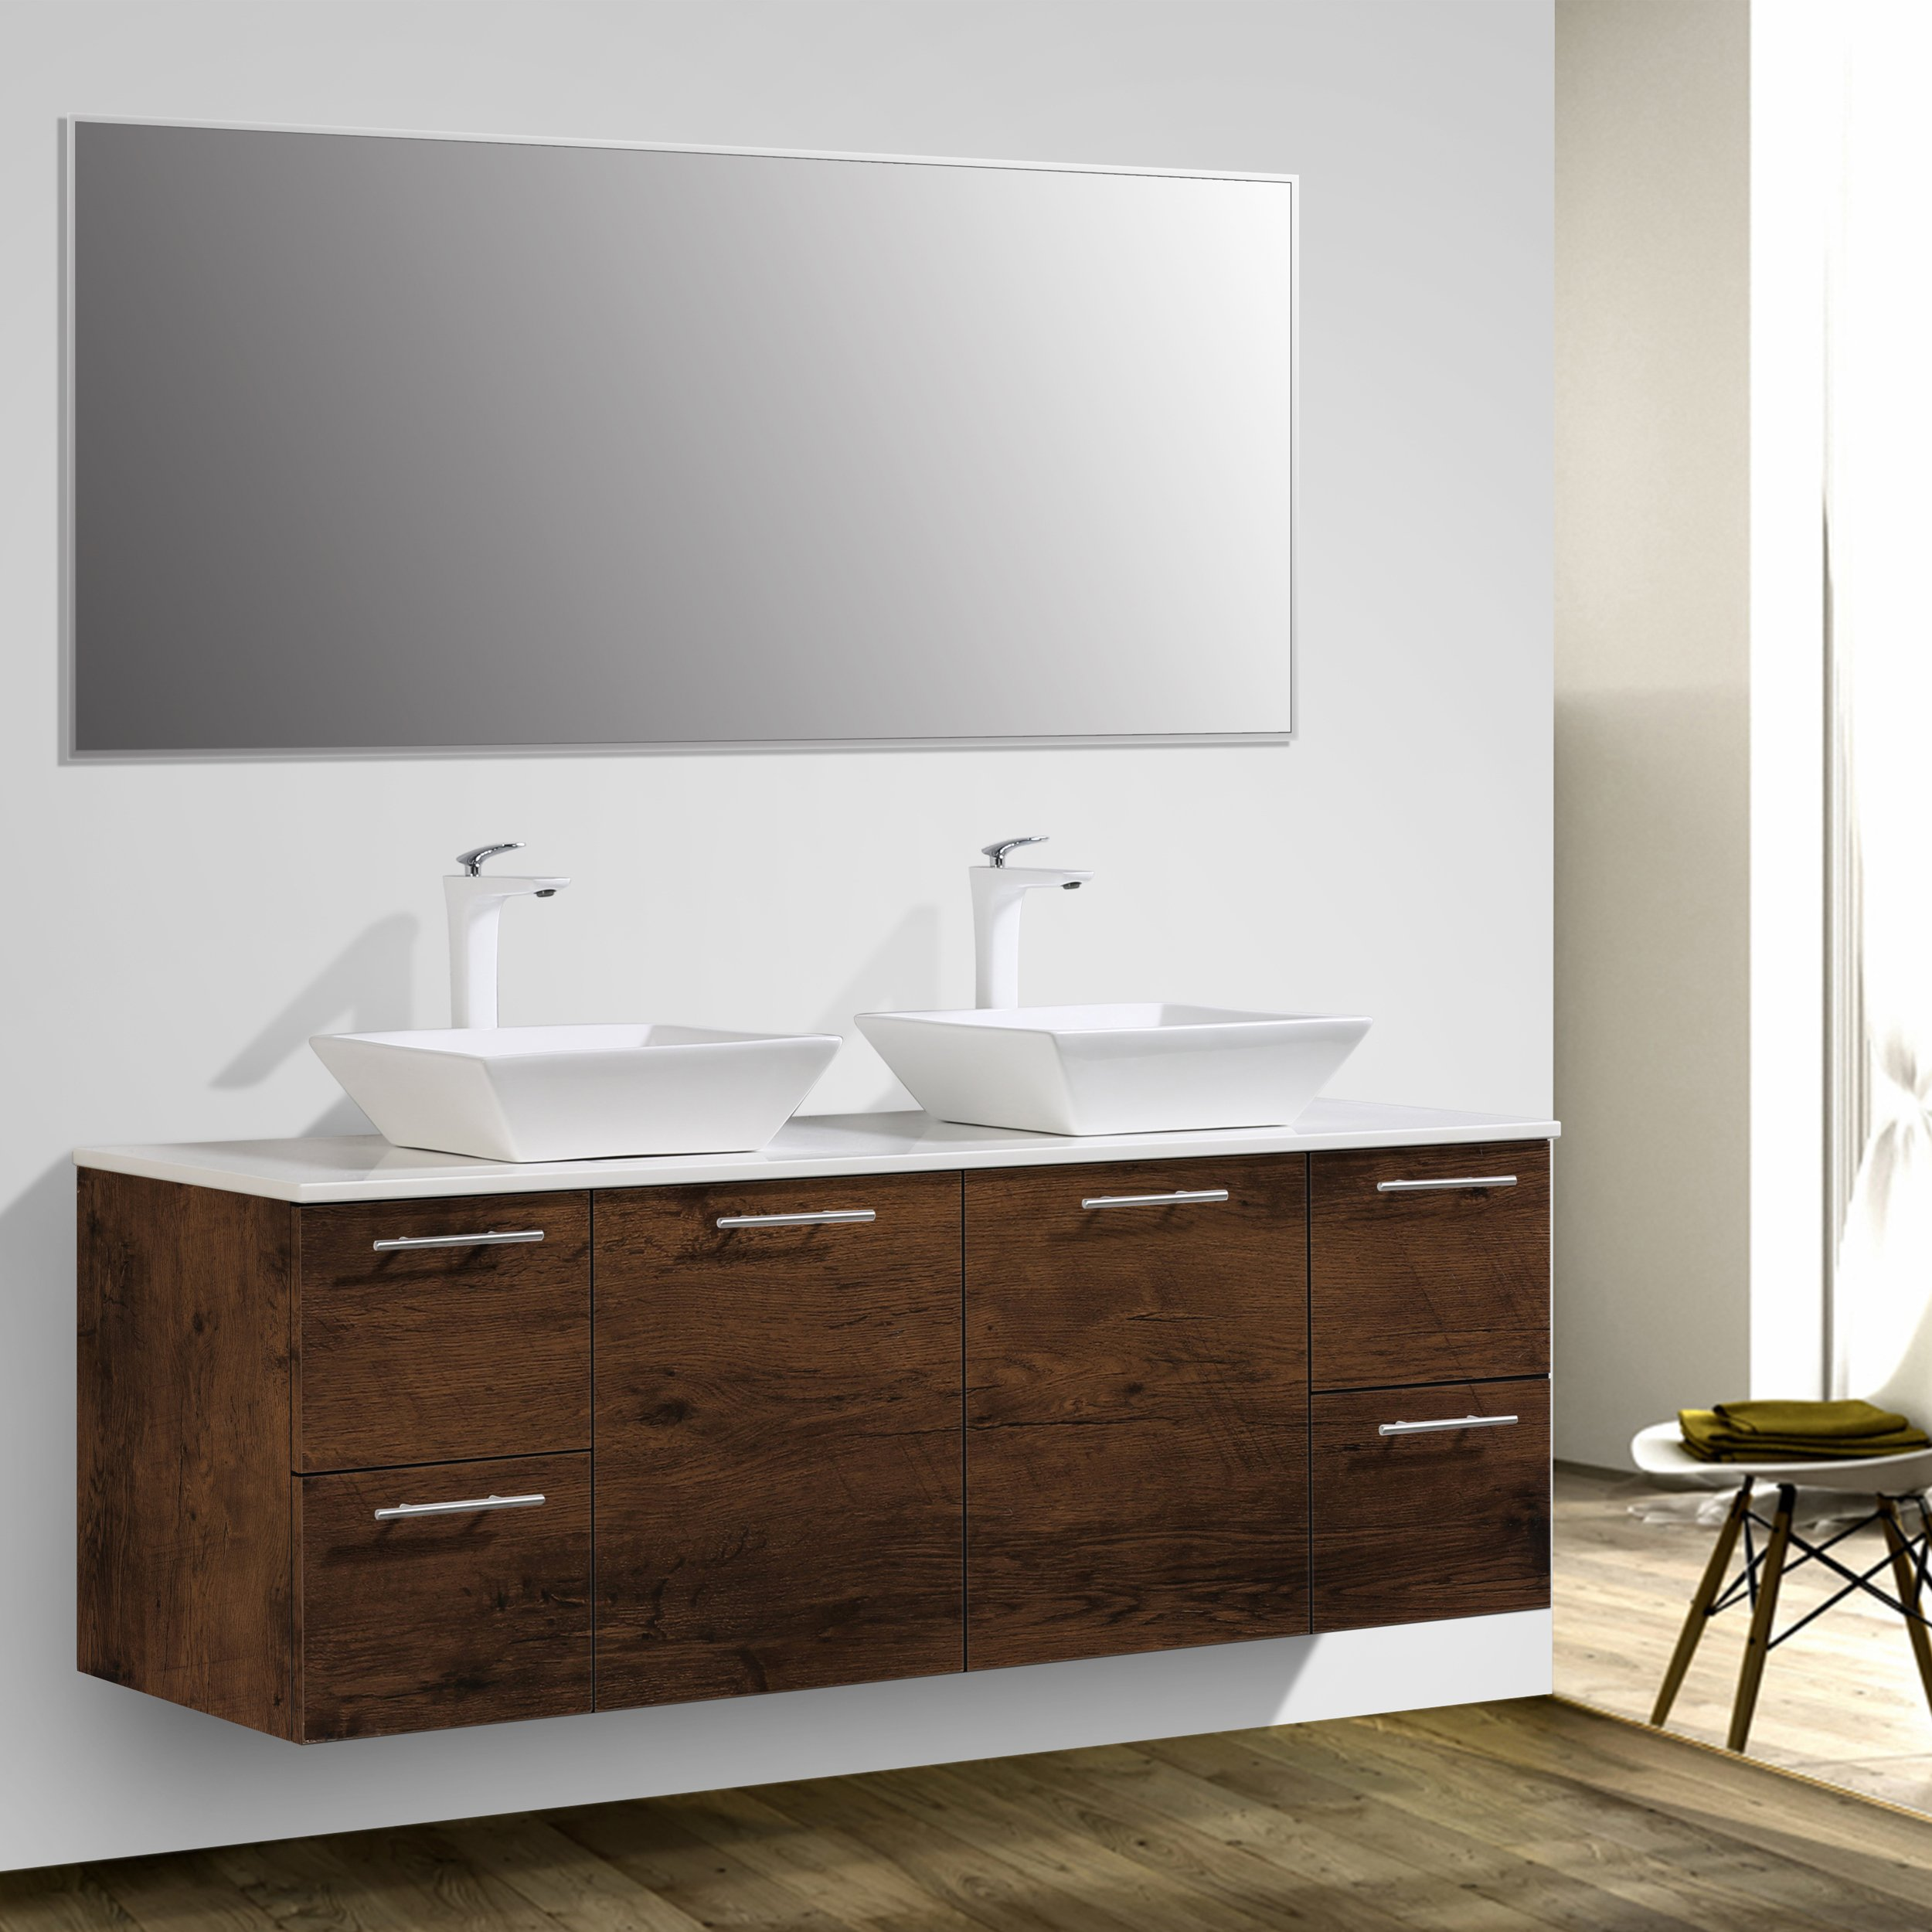 Eviva Luxury 60 inch Rosewood bathroom vanity with top